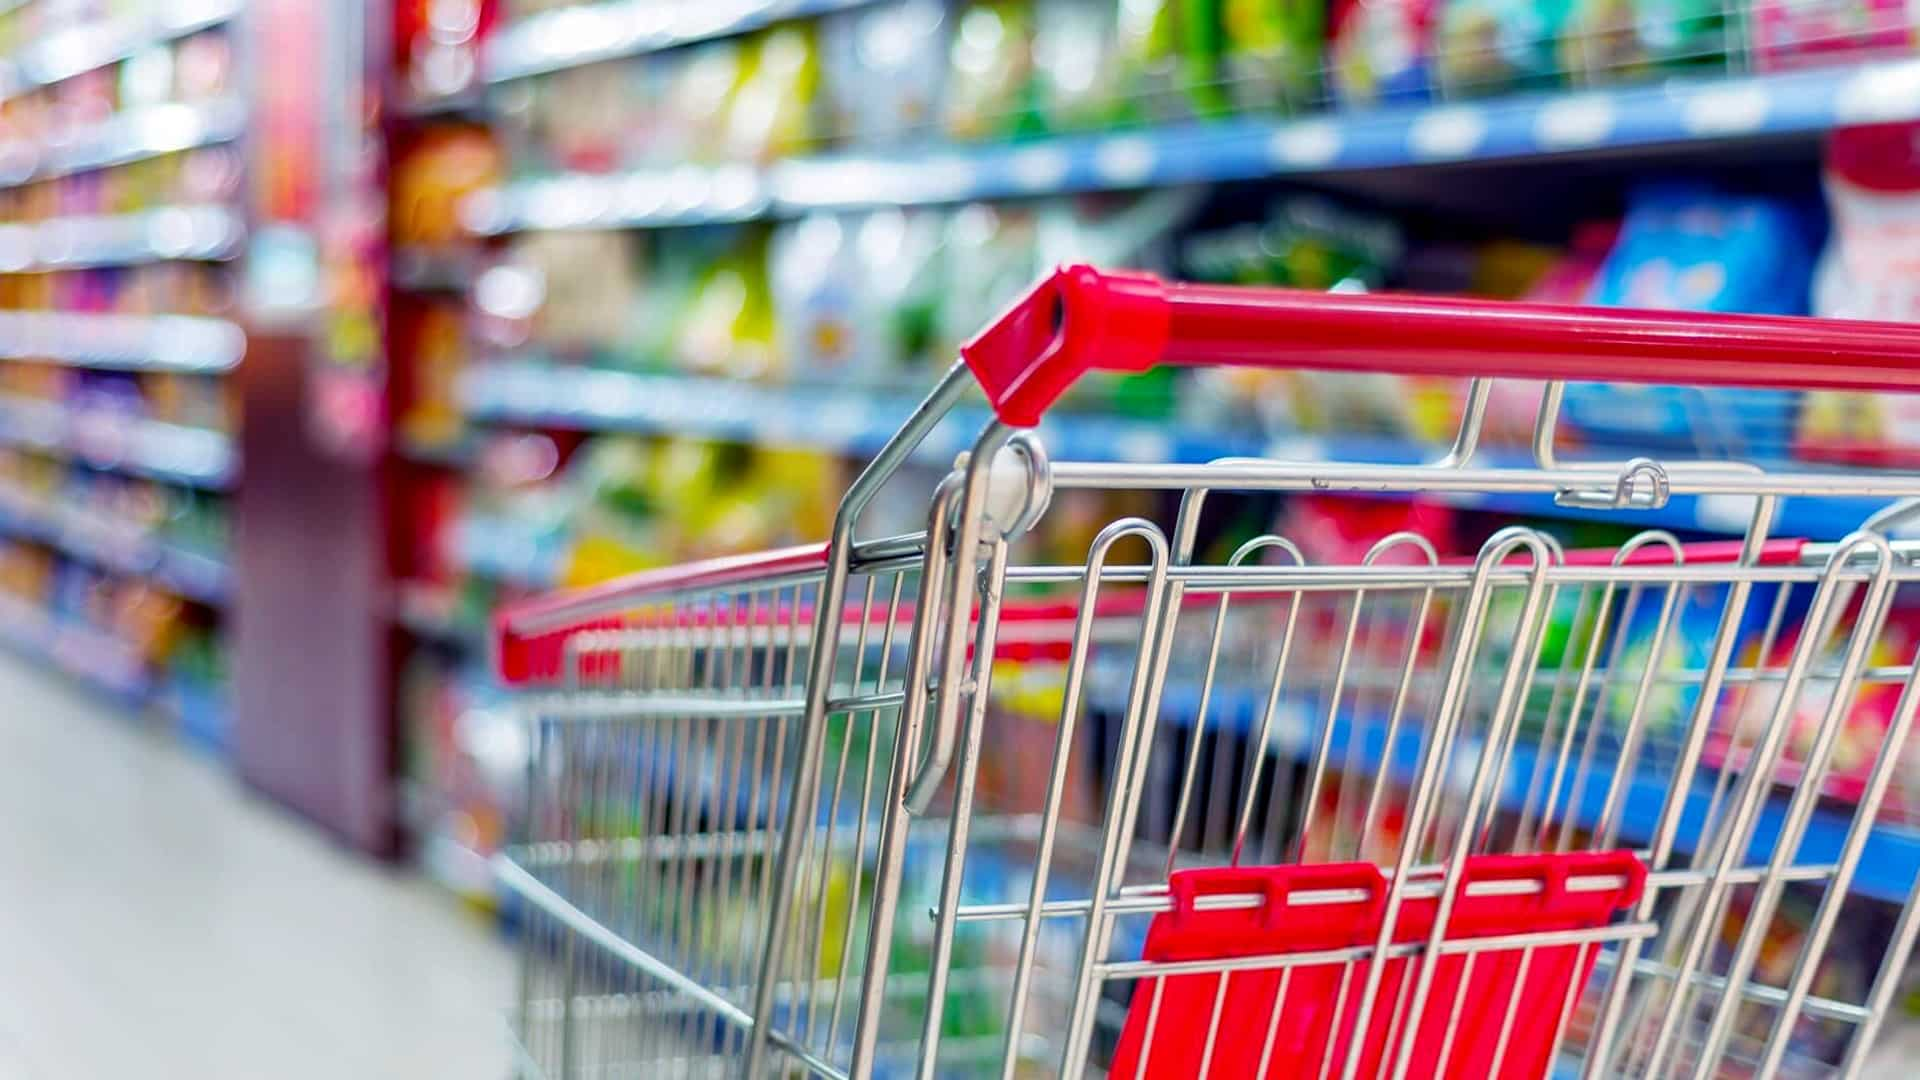 Flipkart says working on scaling loyalty programme, grocery, fashion biz